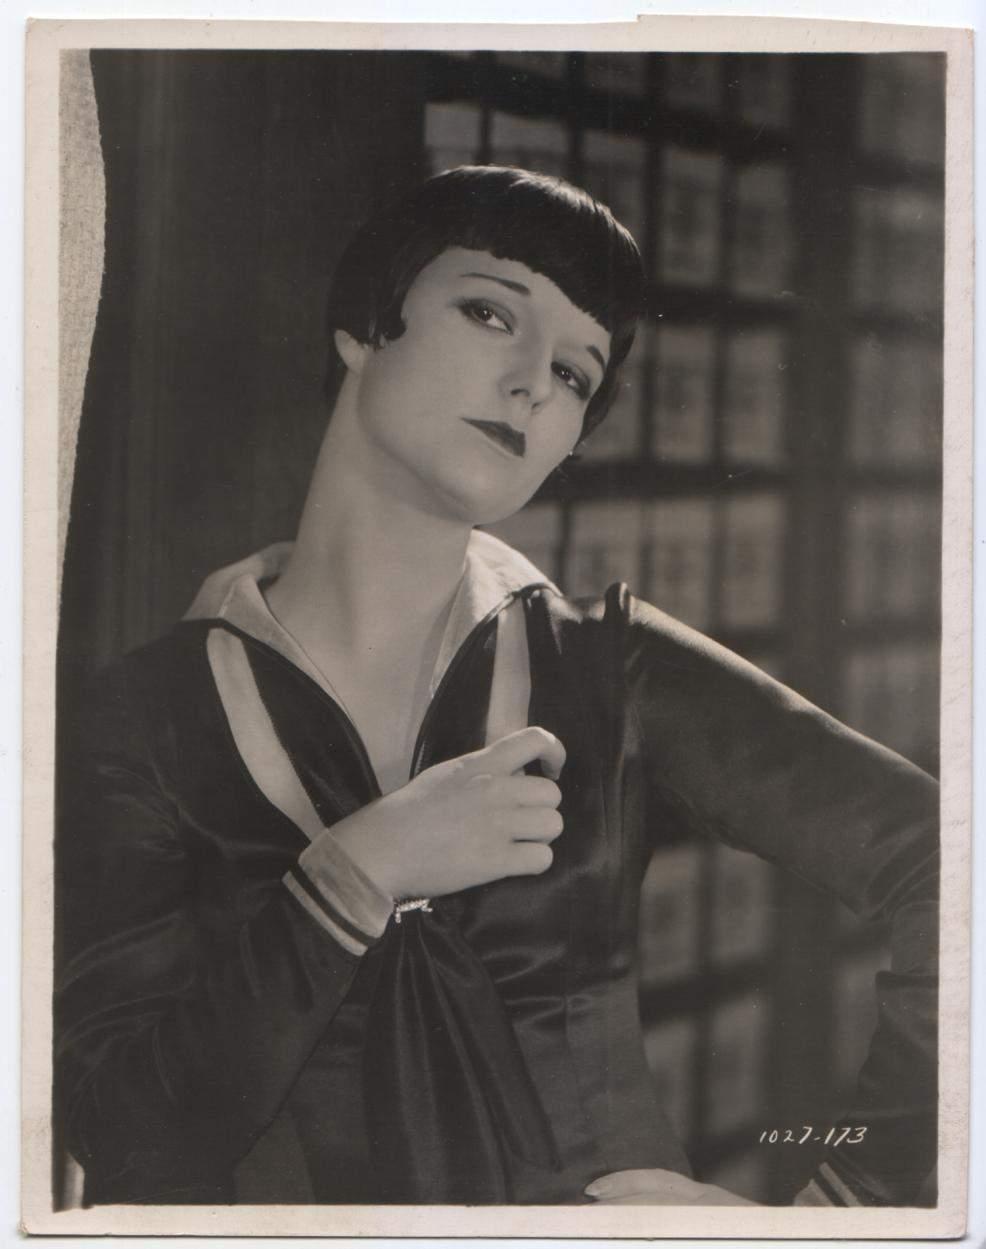 1926 Love 'Em and Leave 'Em - 1027-23